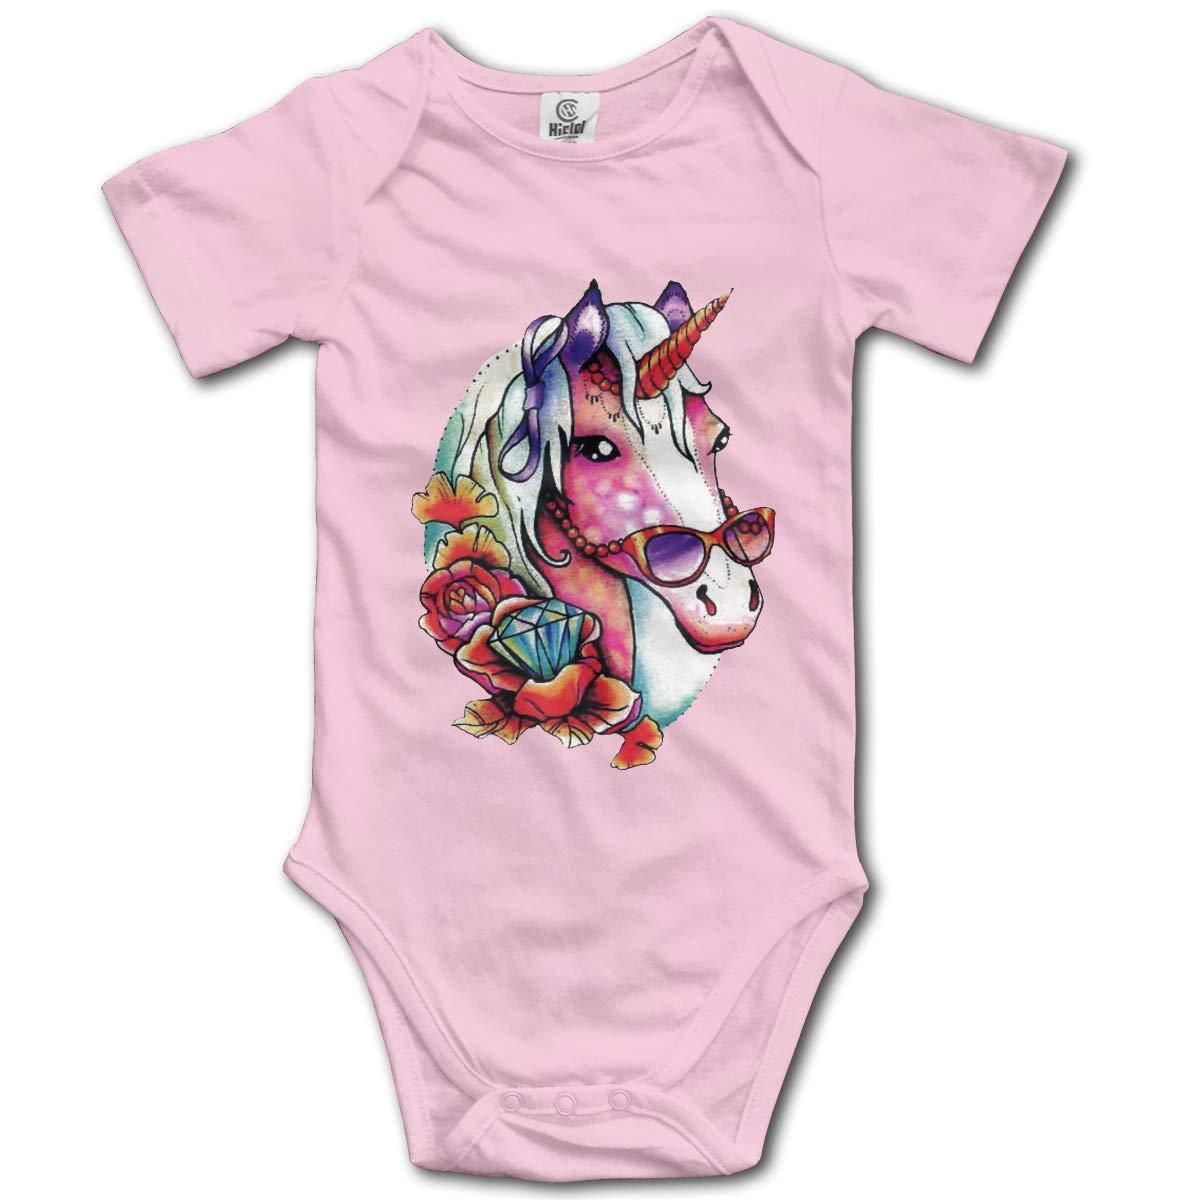 Unicorns with Sunglasses Newborn Infant Toddler Baby Girls Boys Bodysuit Short Sleeve 0-24 MonthsBlack